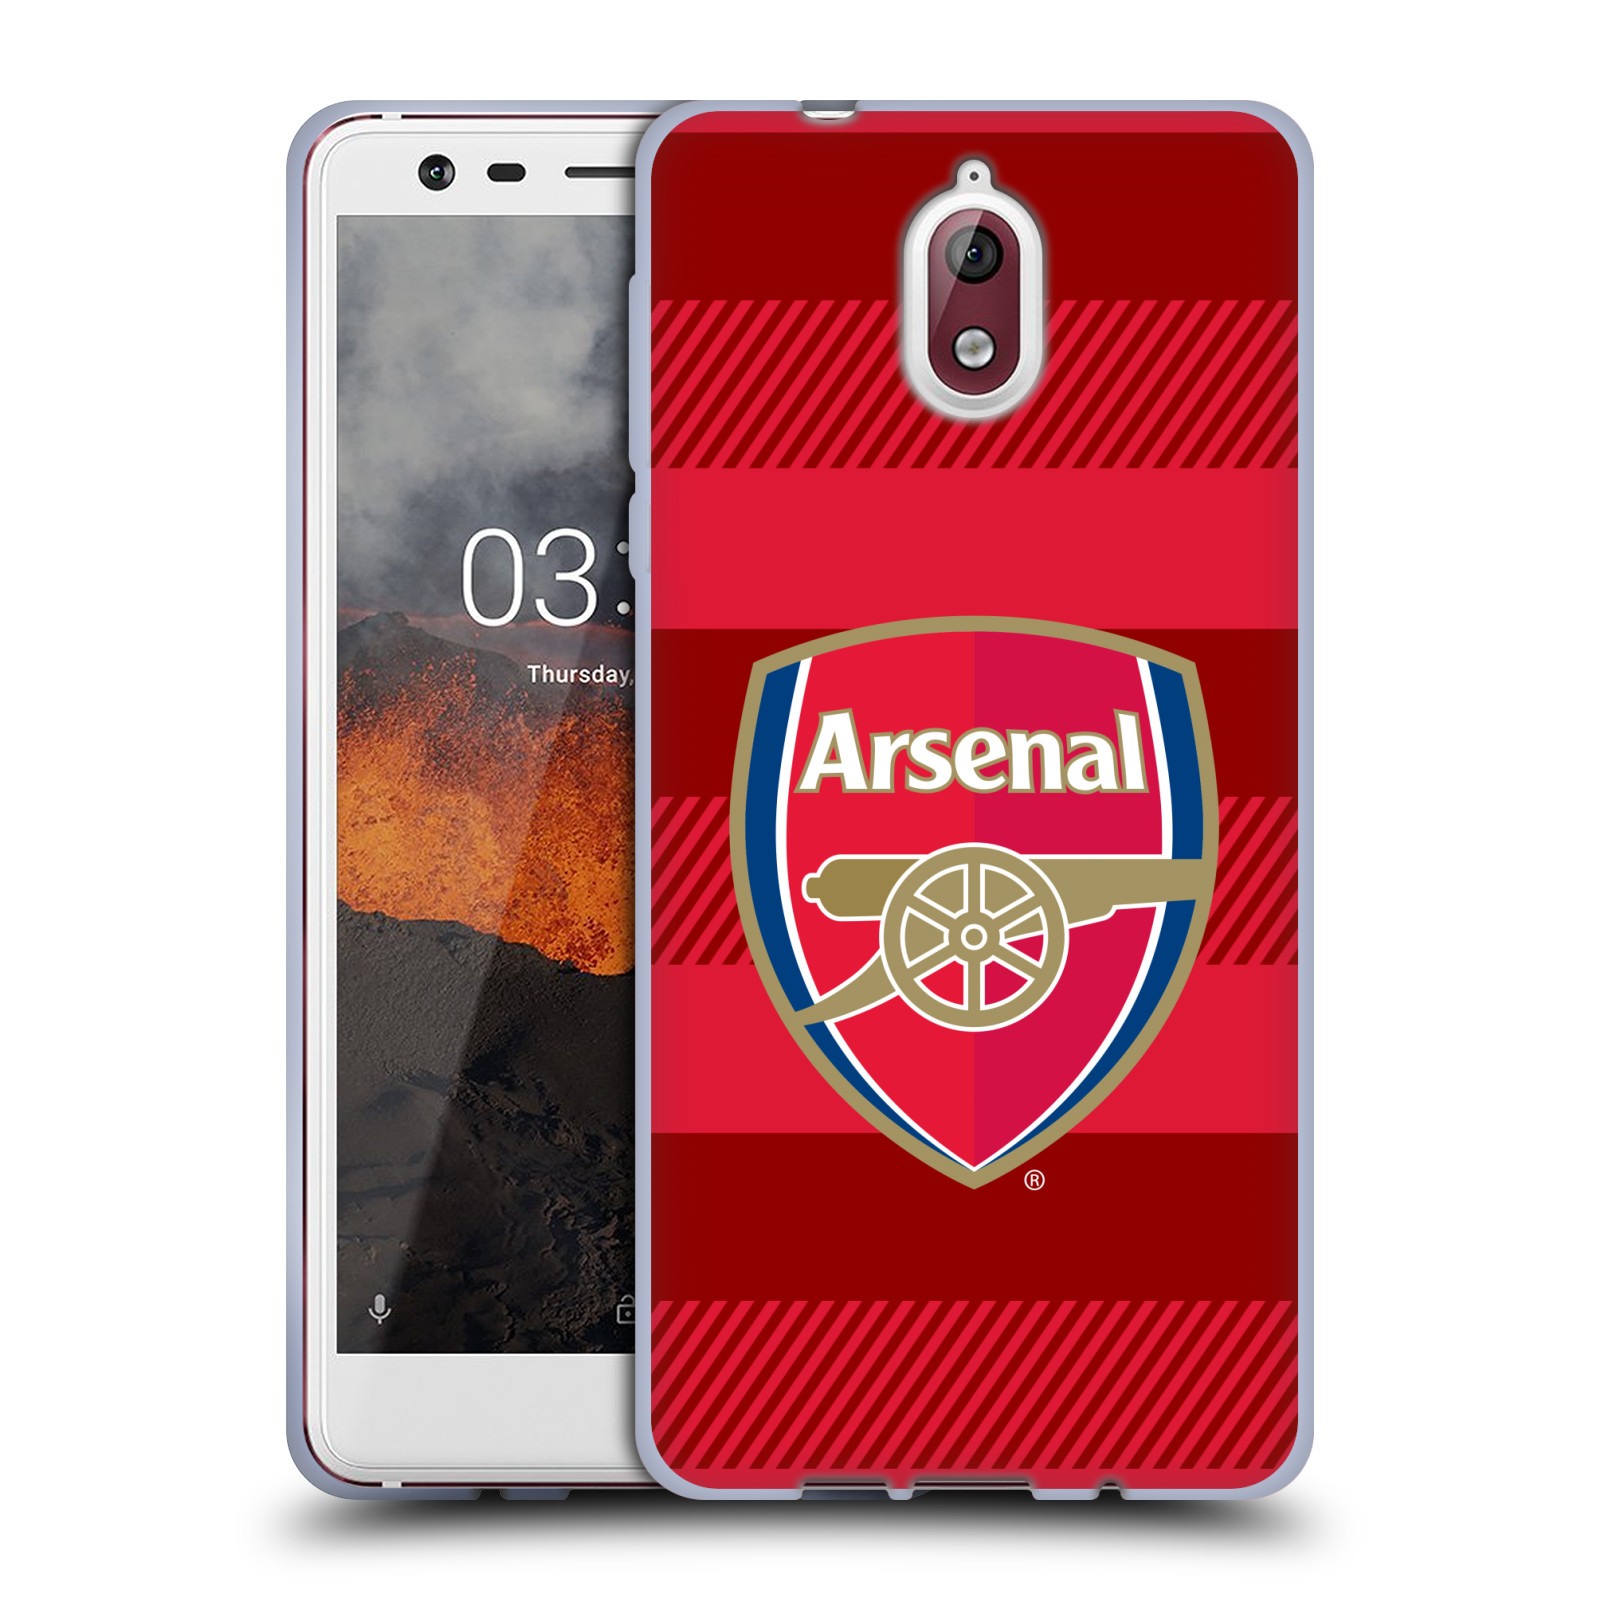 Silikonové pouzdro na mobil Nokia 3.1 - Head Case - Arsenal FC - Logo s pruhy